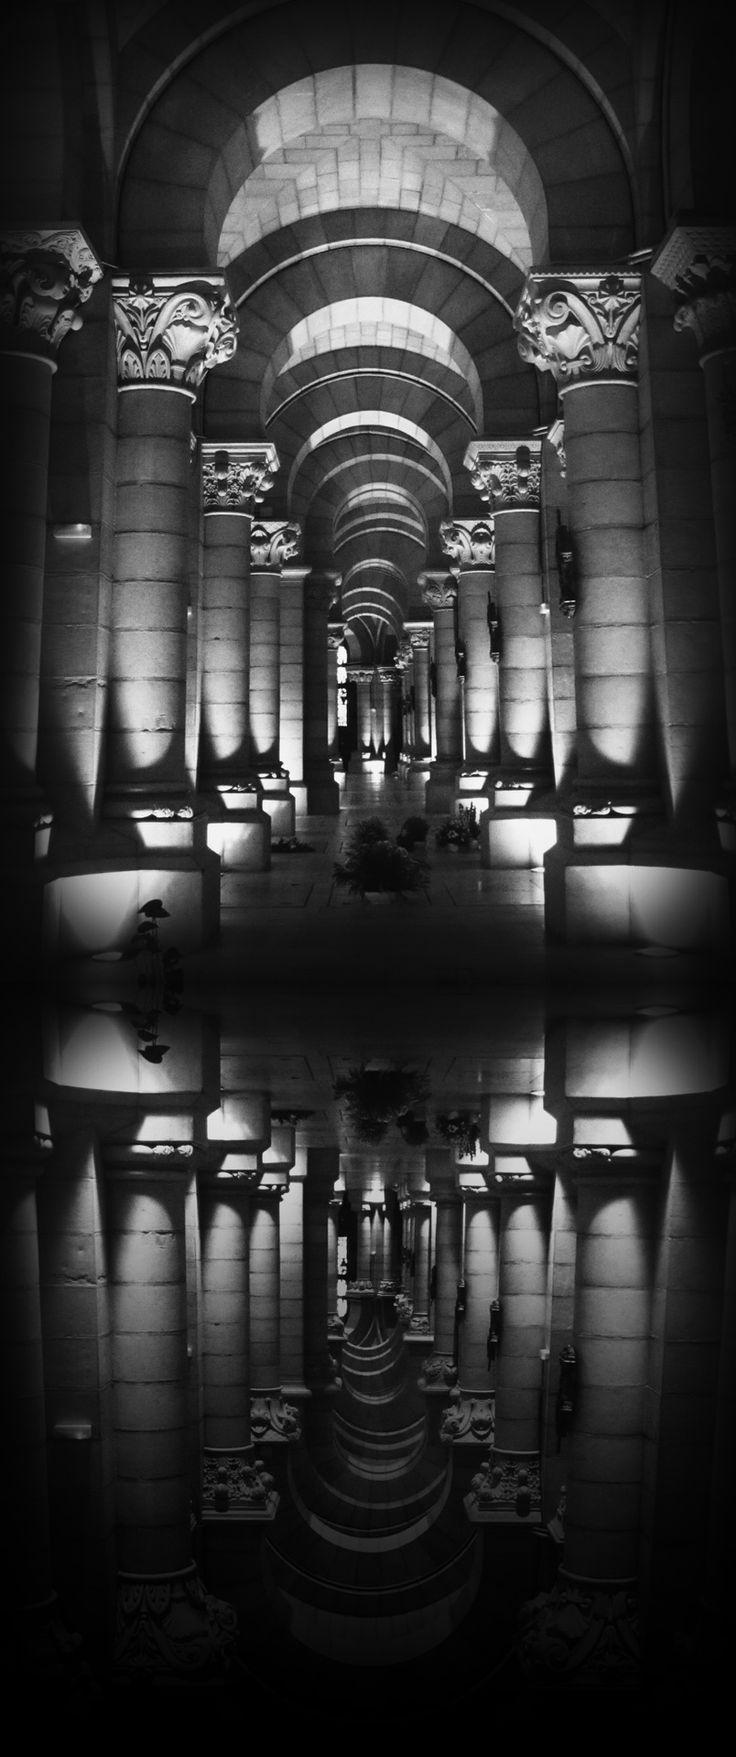 The Crypts of the Cathedral de la Almuneda Madrid, Spain (image source: Laura B Fernandez)